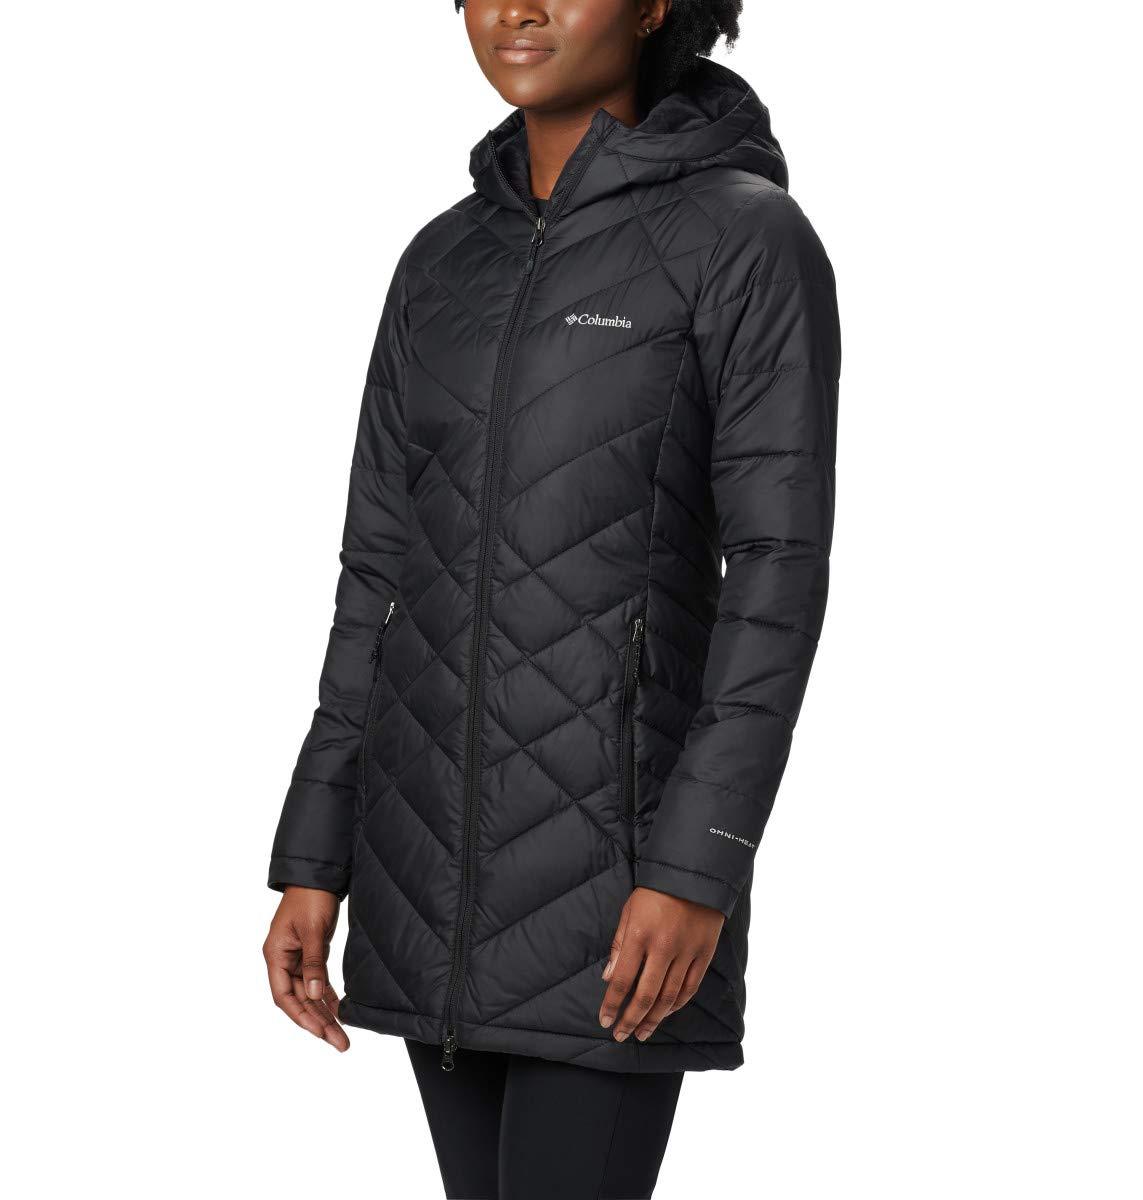 Columbia Women's Standard Heavenly Long Hooded Jacket, Black, Medium by Columbia